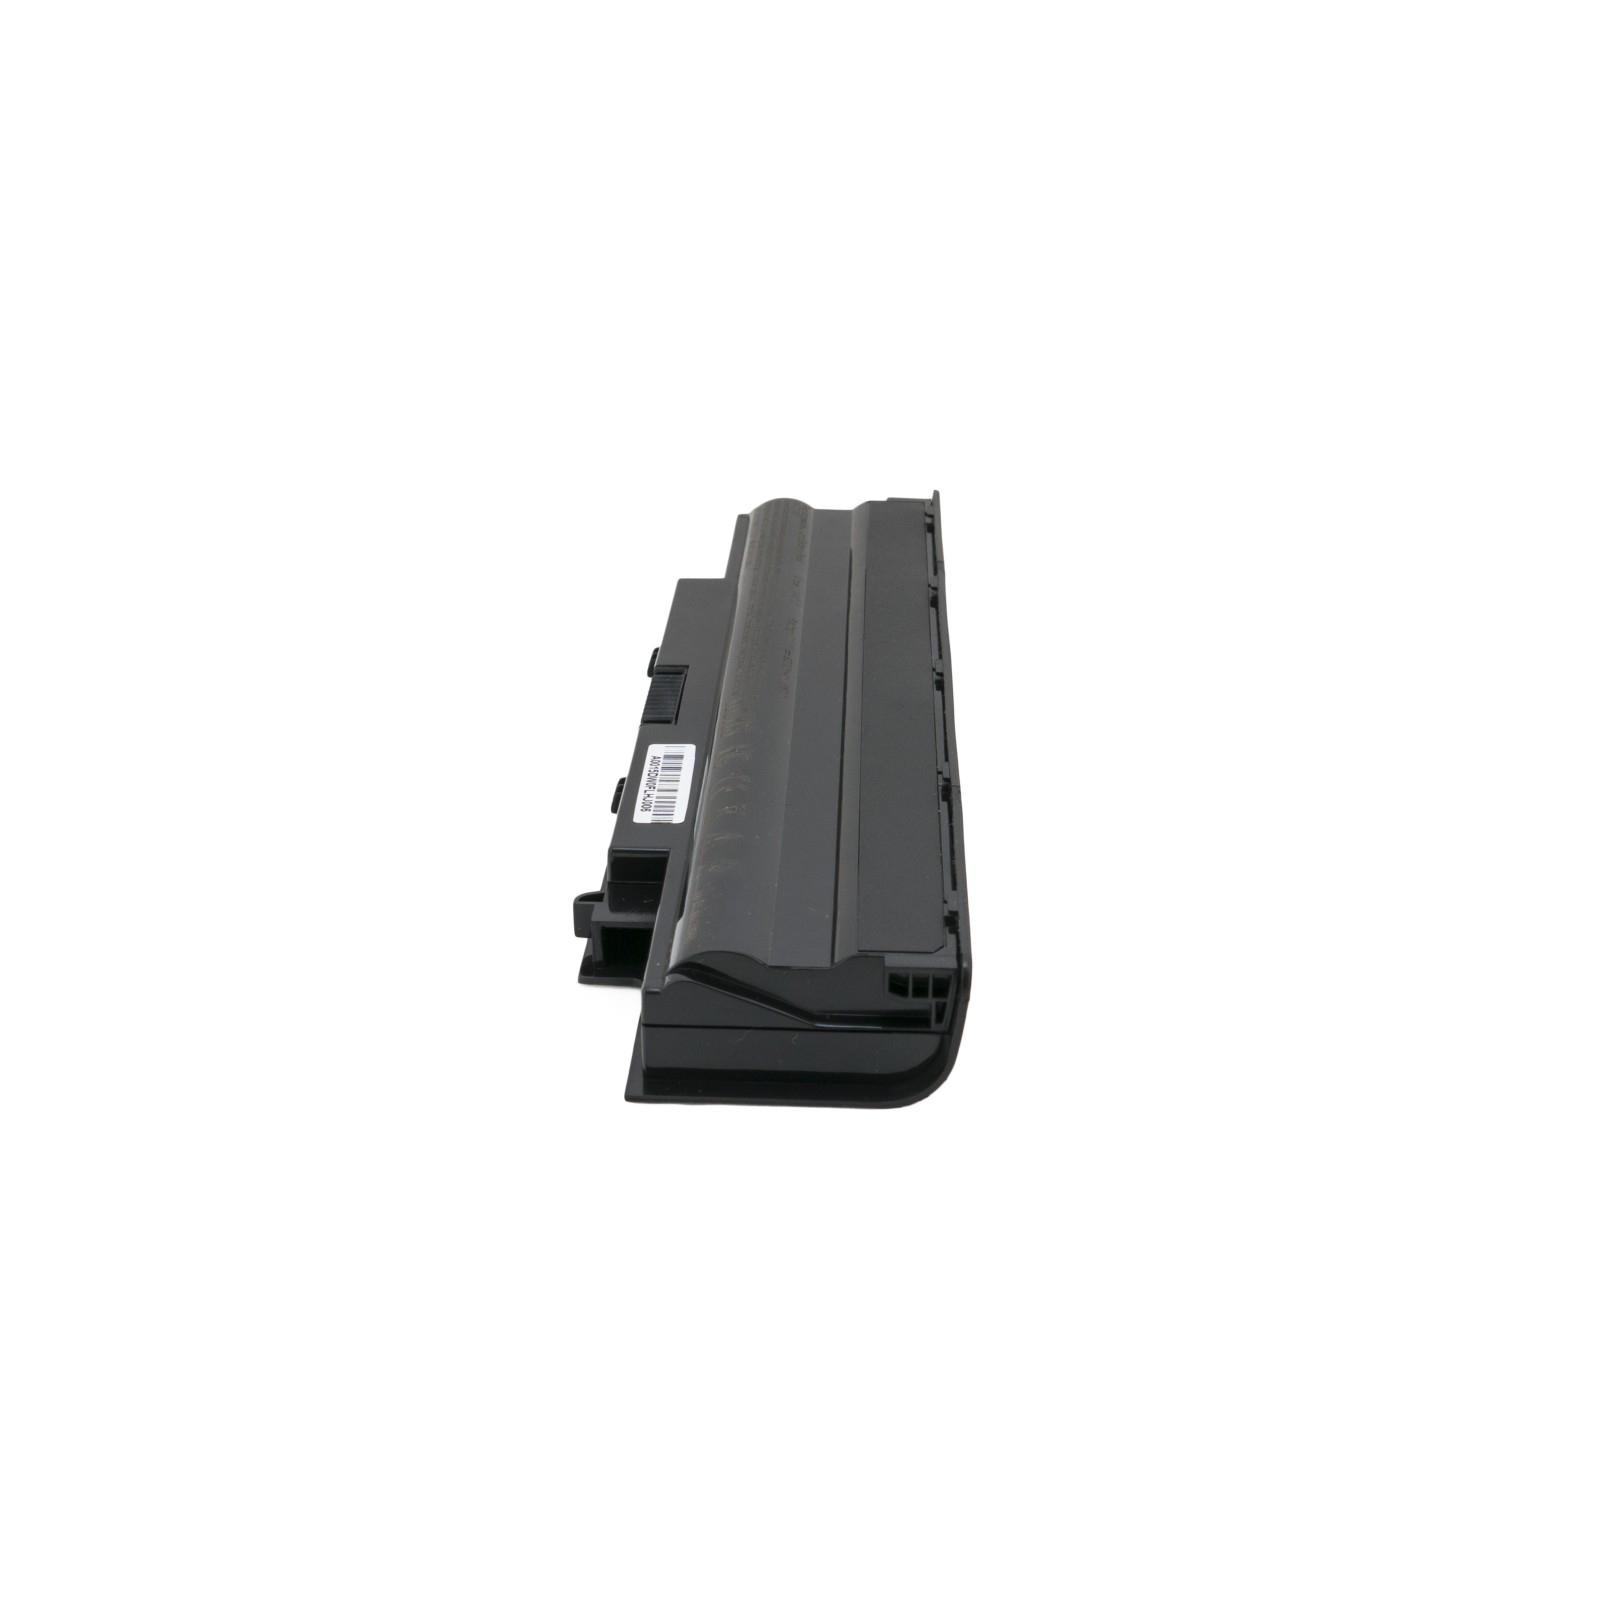 Аккумулятор для ноутбука Dell Inspiron N4010, 5200mAh EXTRADIGITAL (BND3934) изображение 5